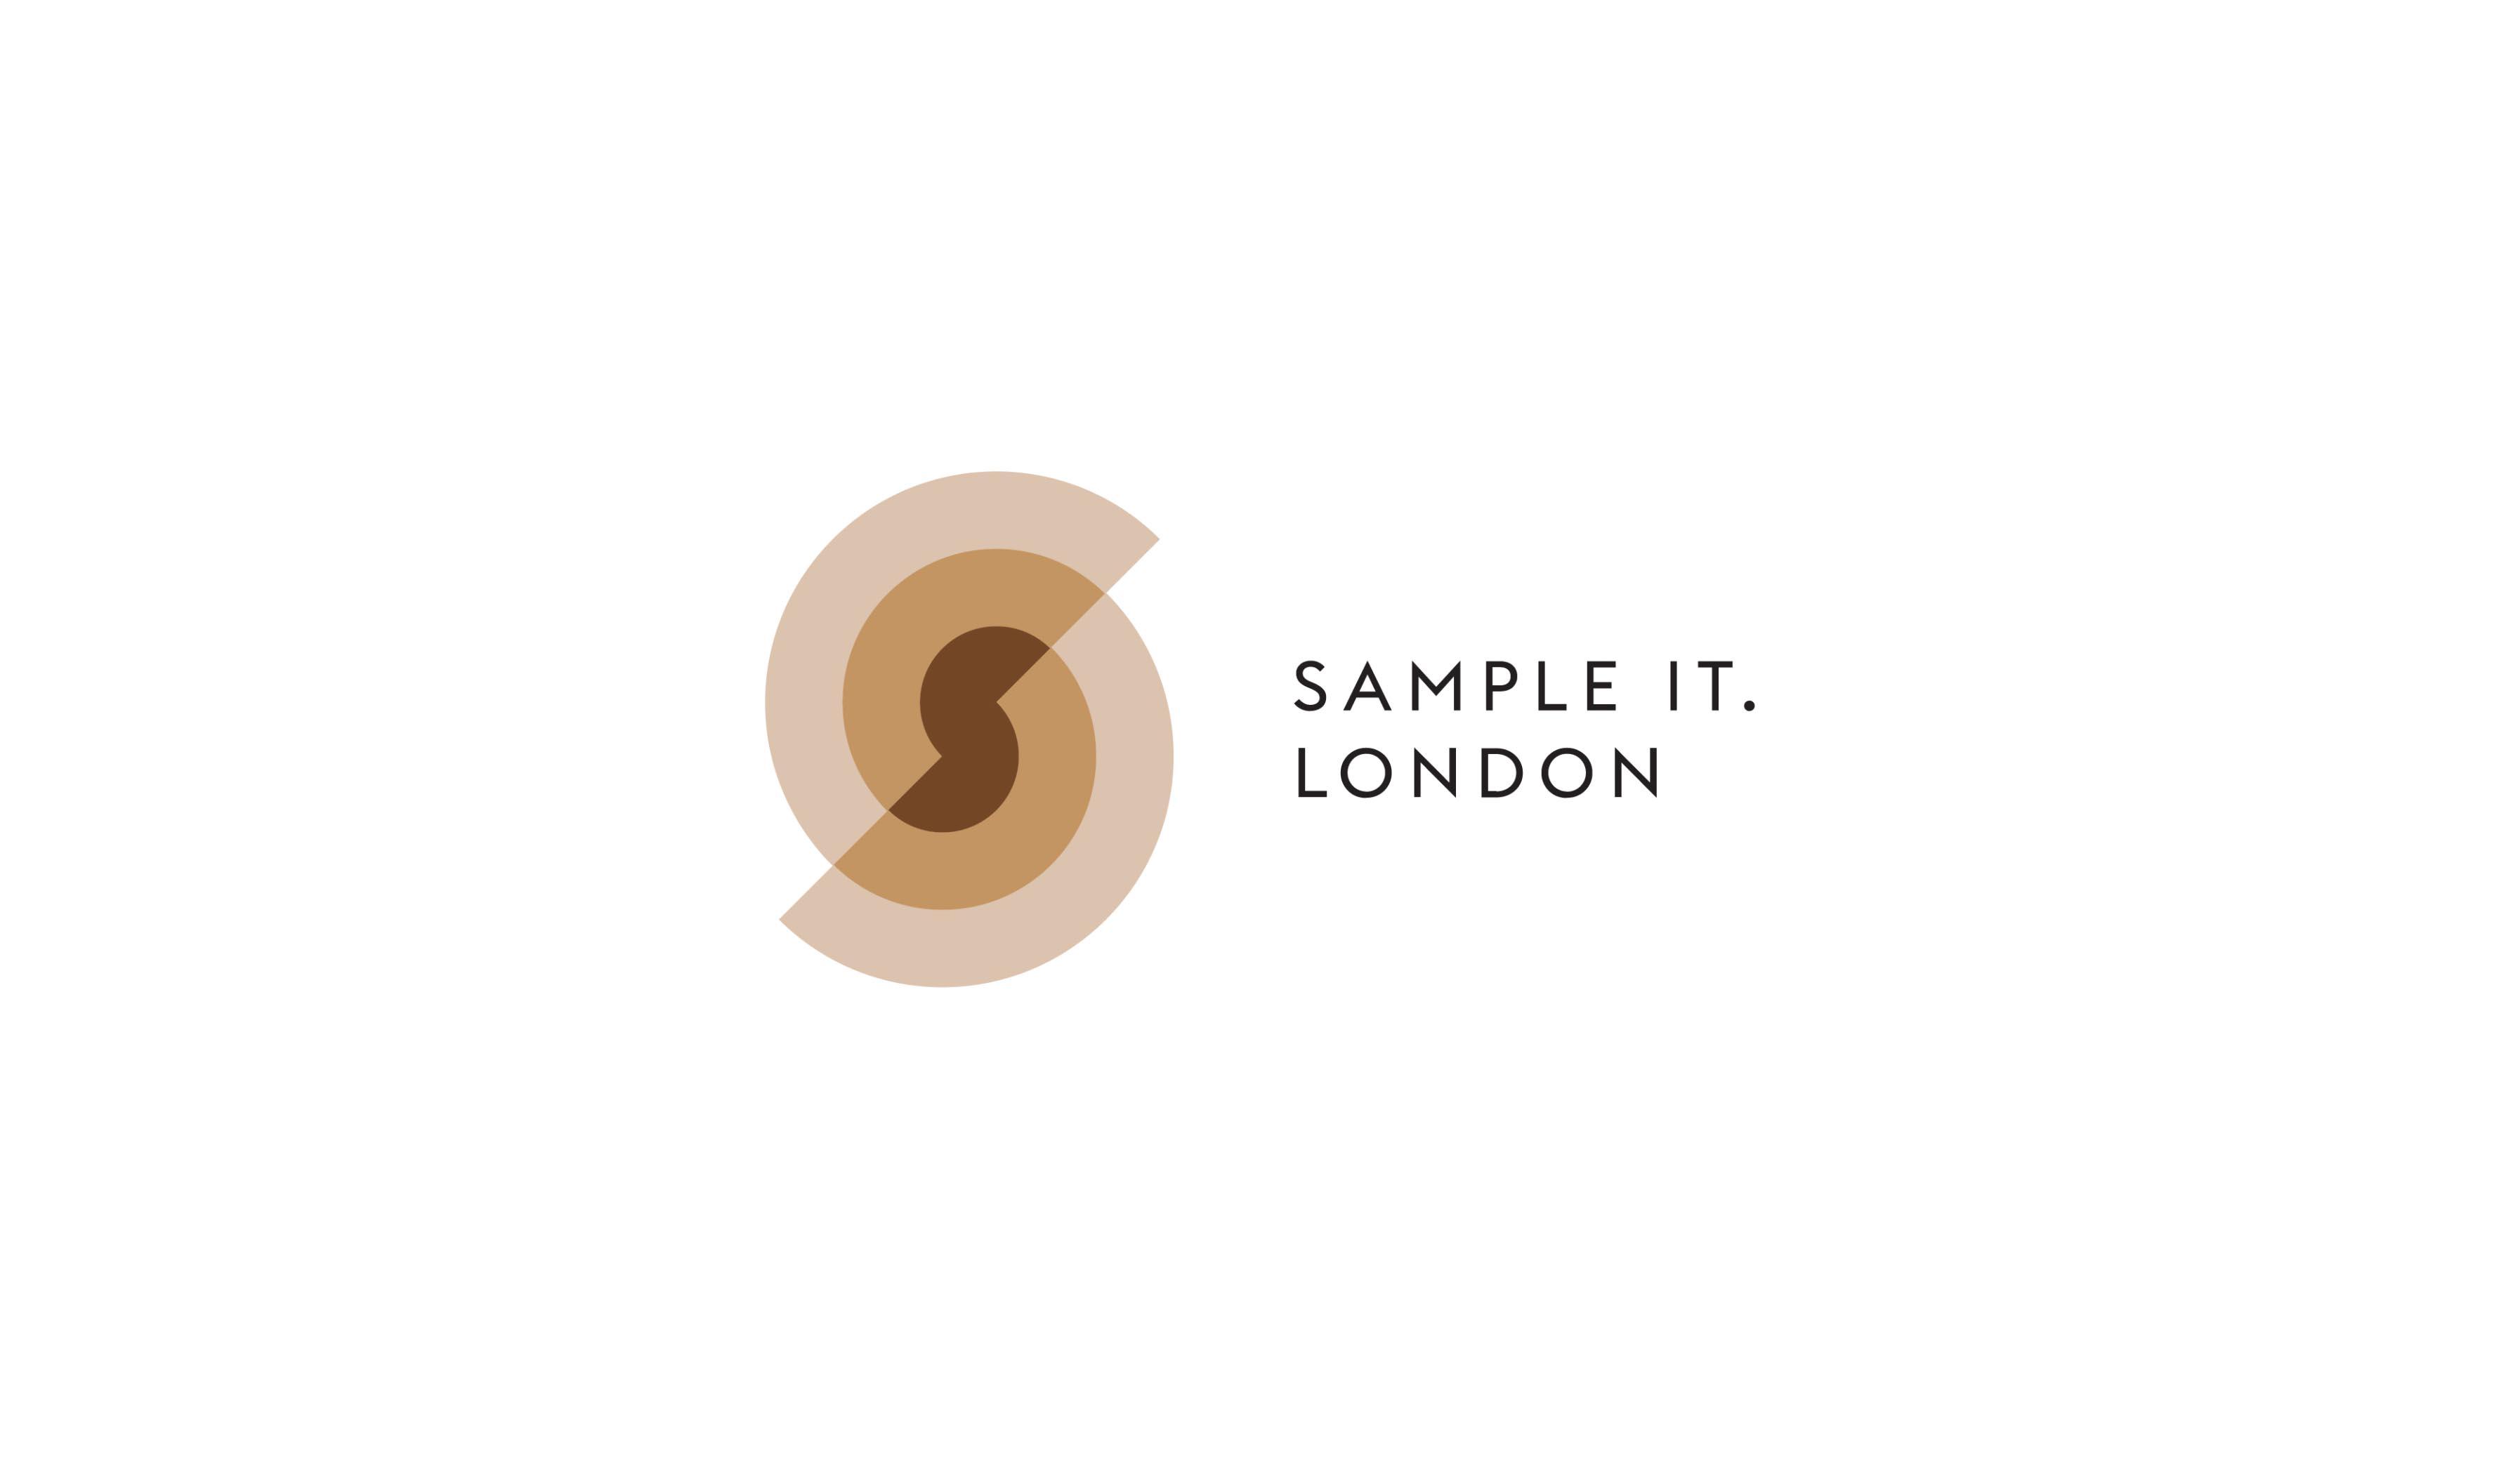 Sample It. London brand identity design